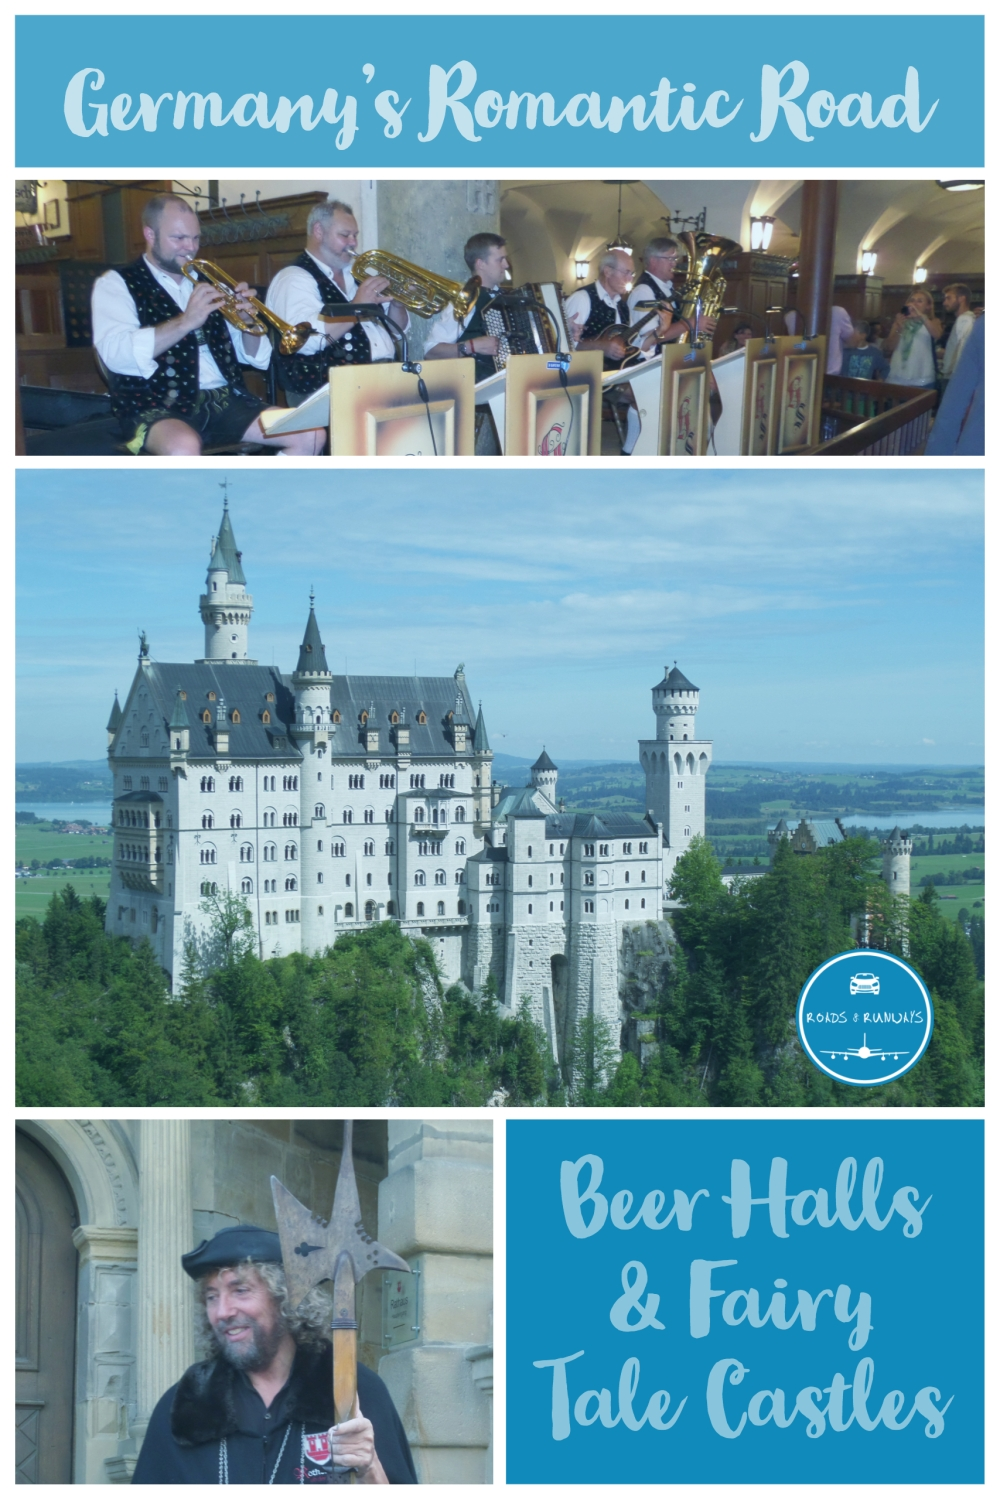 Germany's Romantic Road, Beer Halls & Fairy Tale Castles